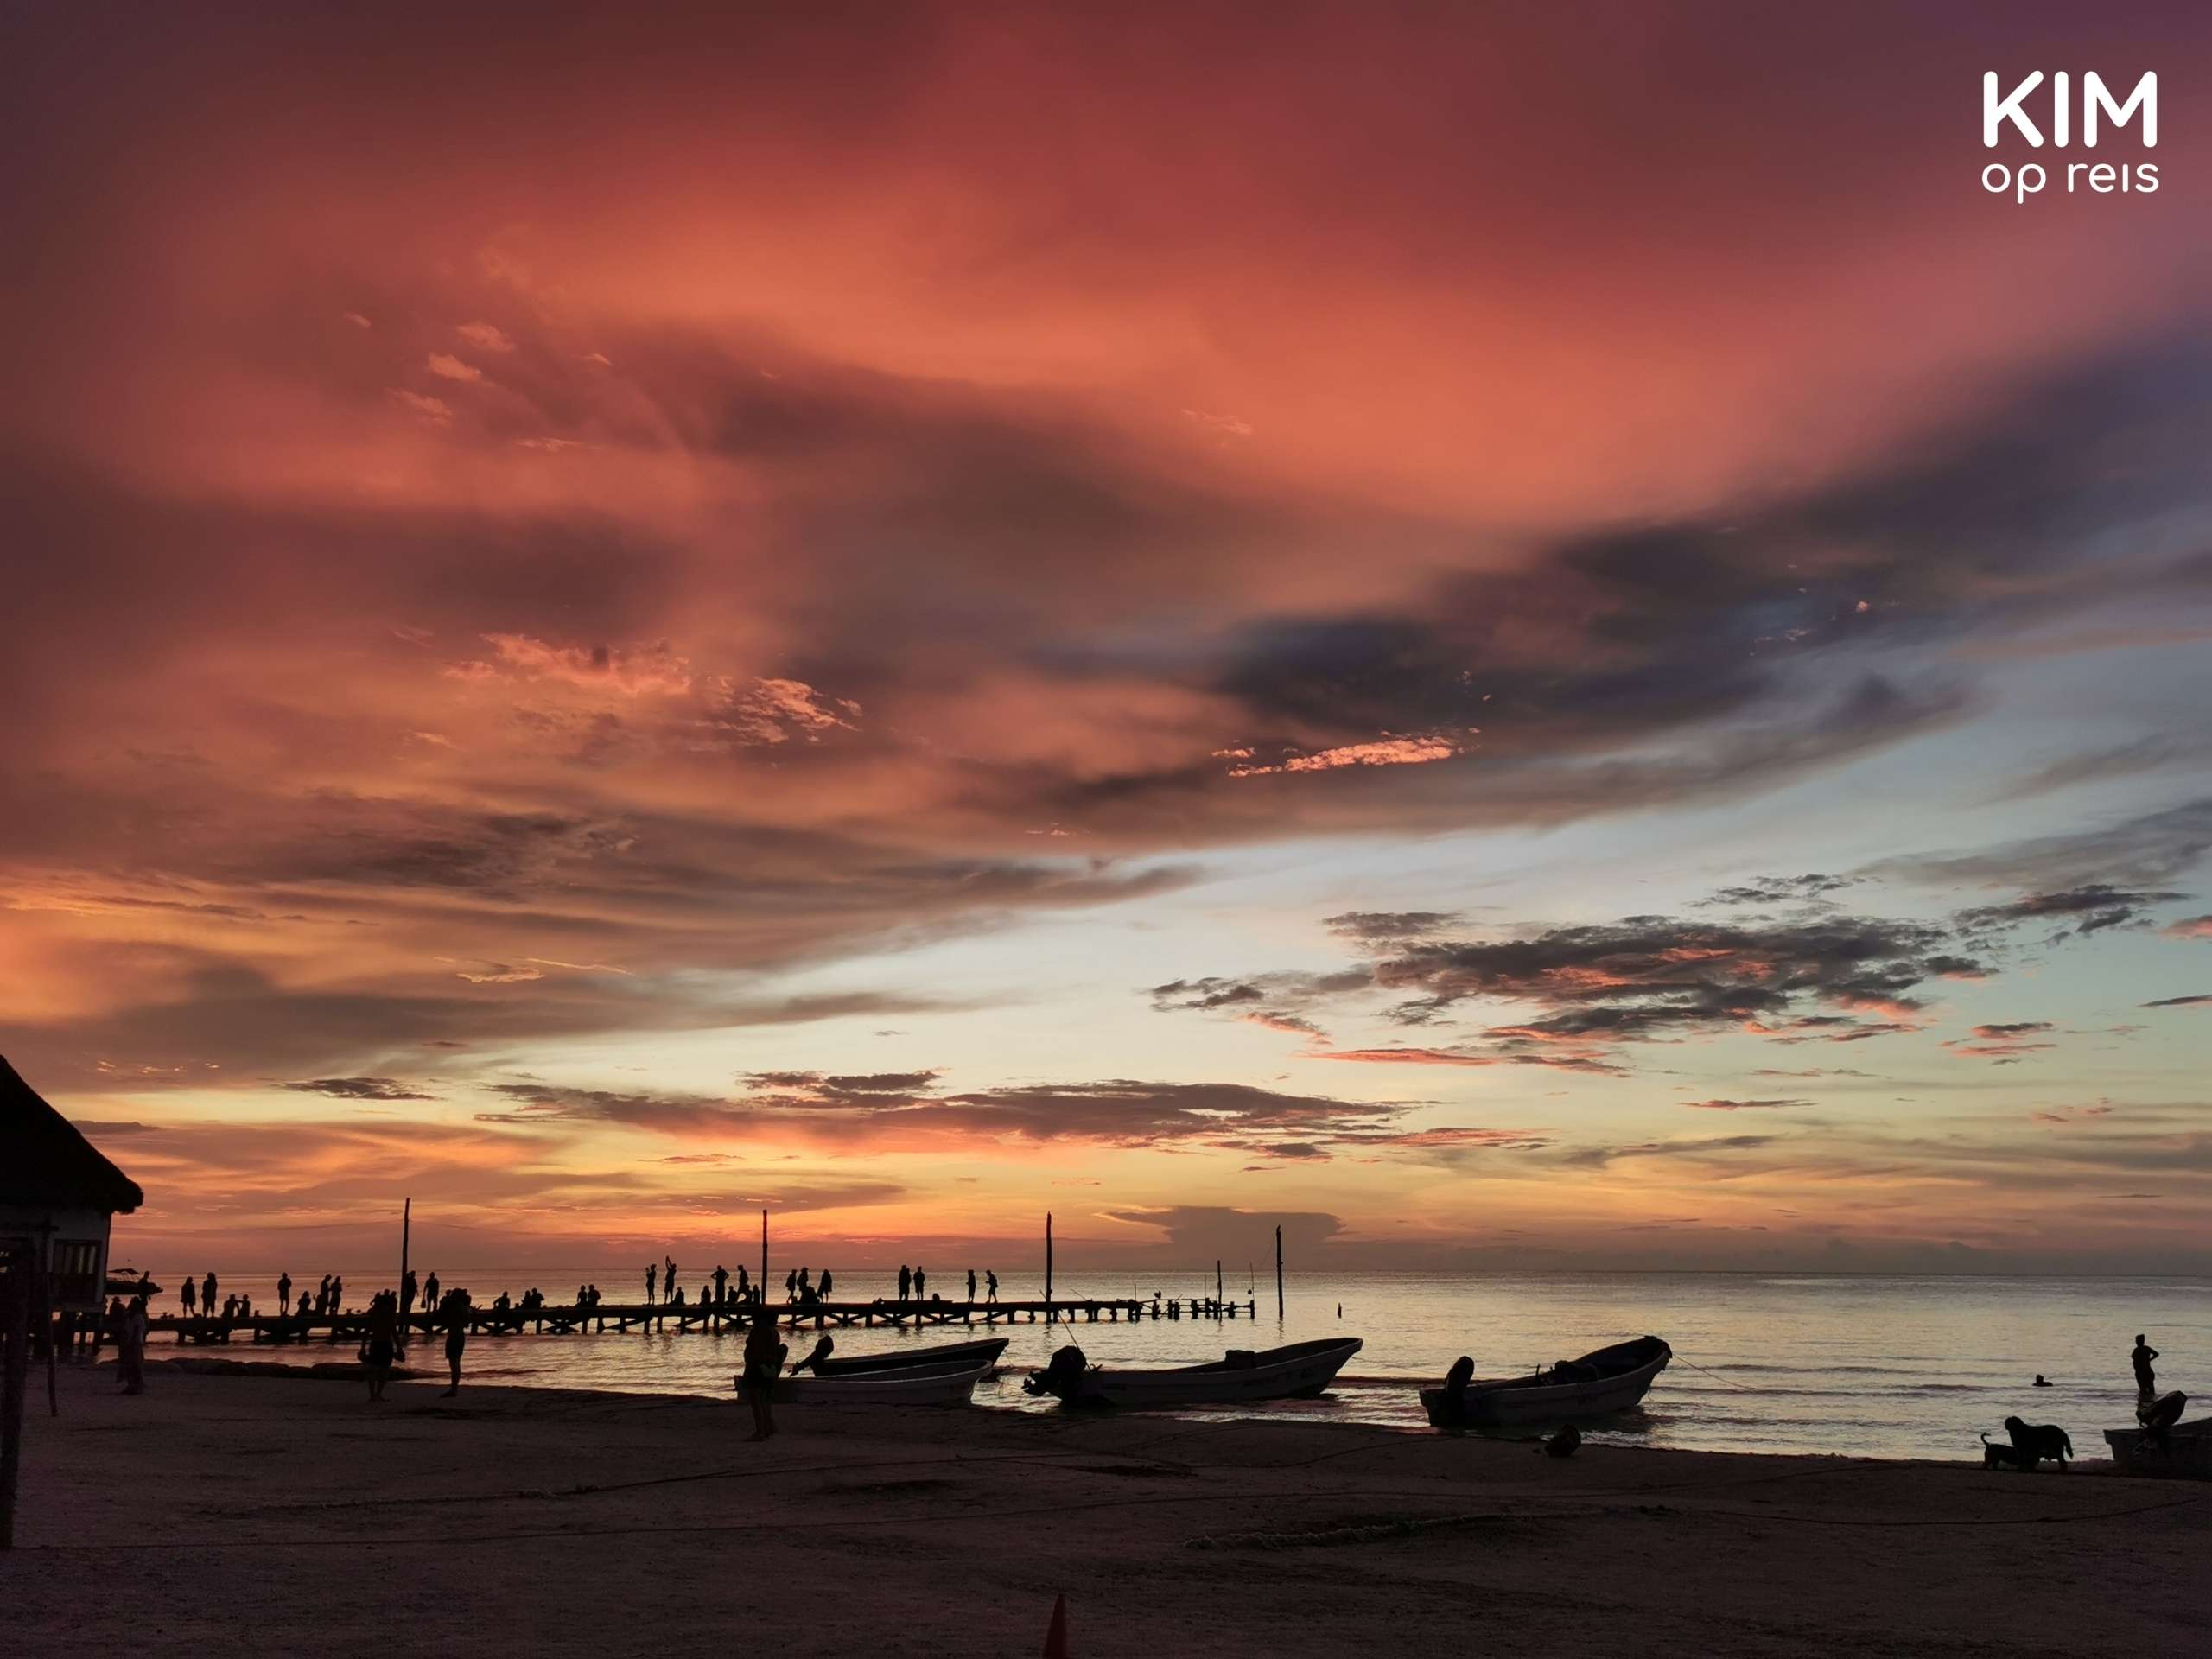 Isla Holbox strand zonsondergang: zonsondergang aan het strand